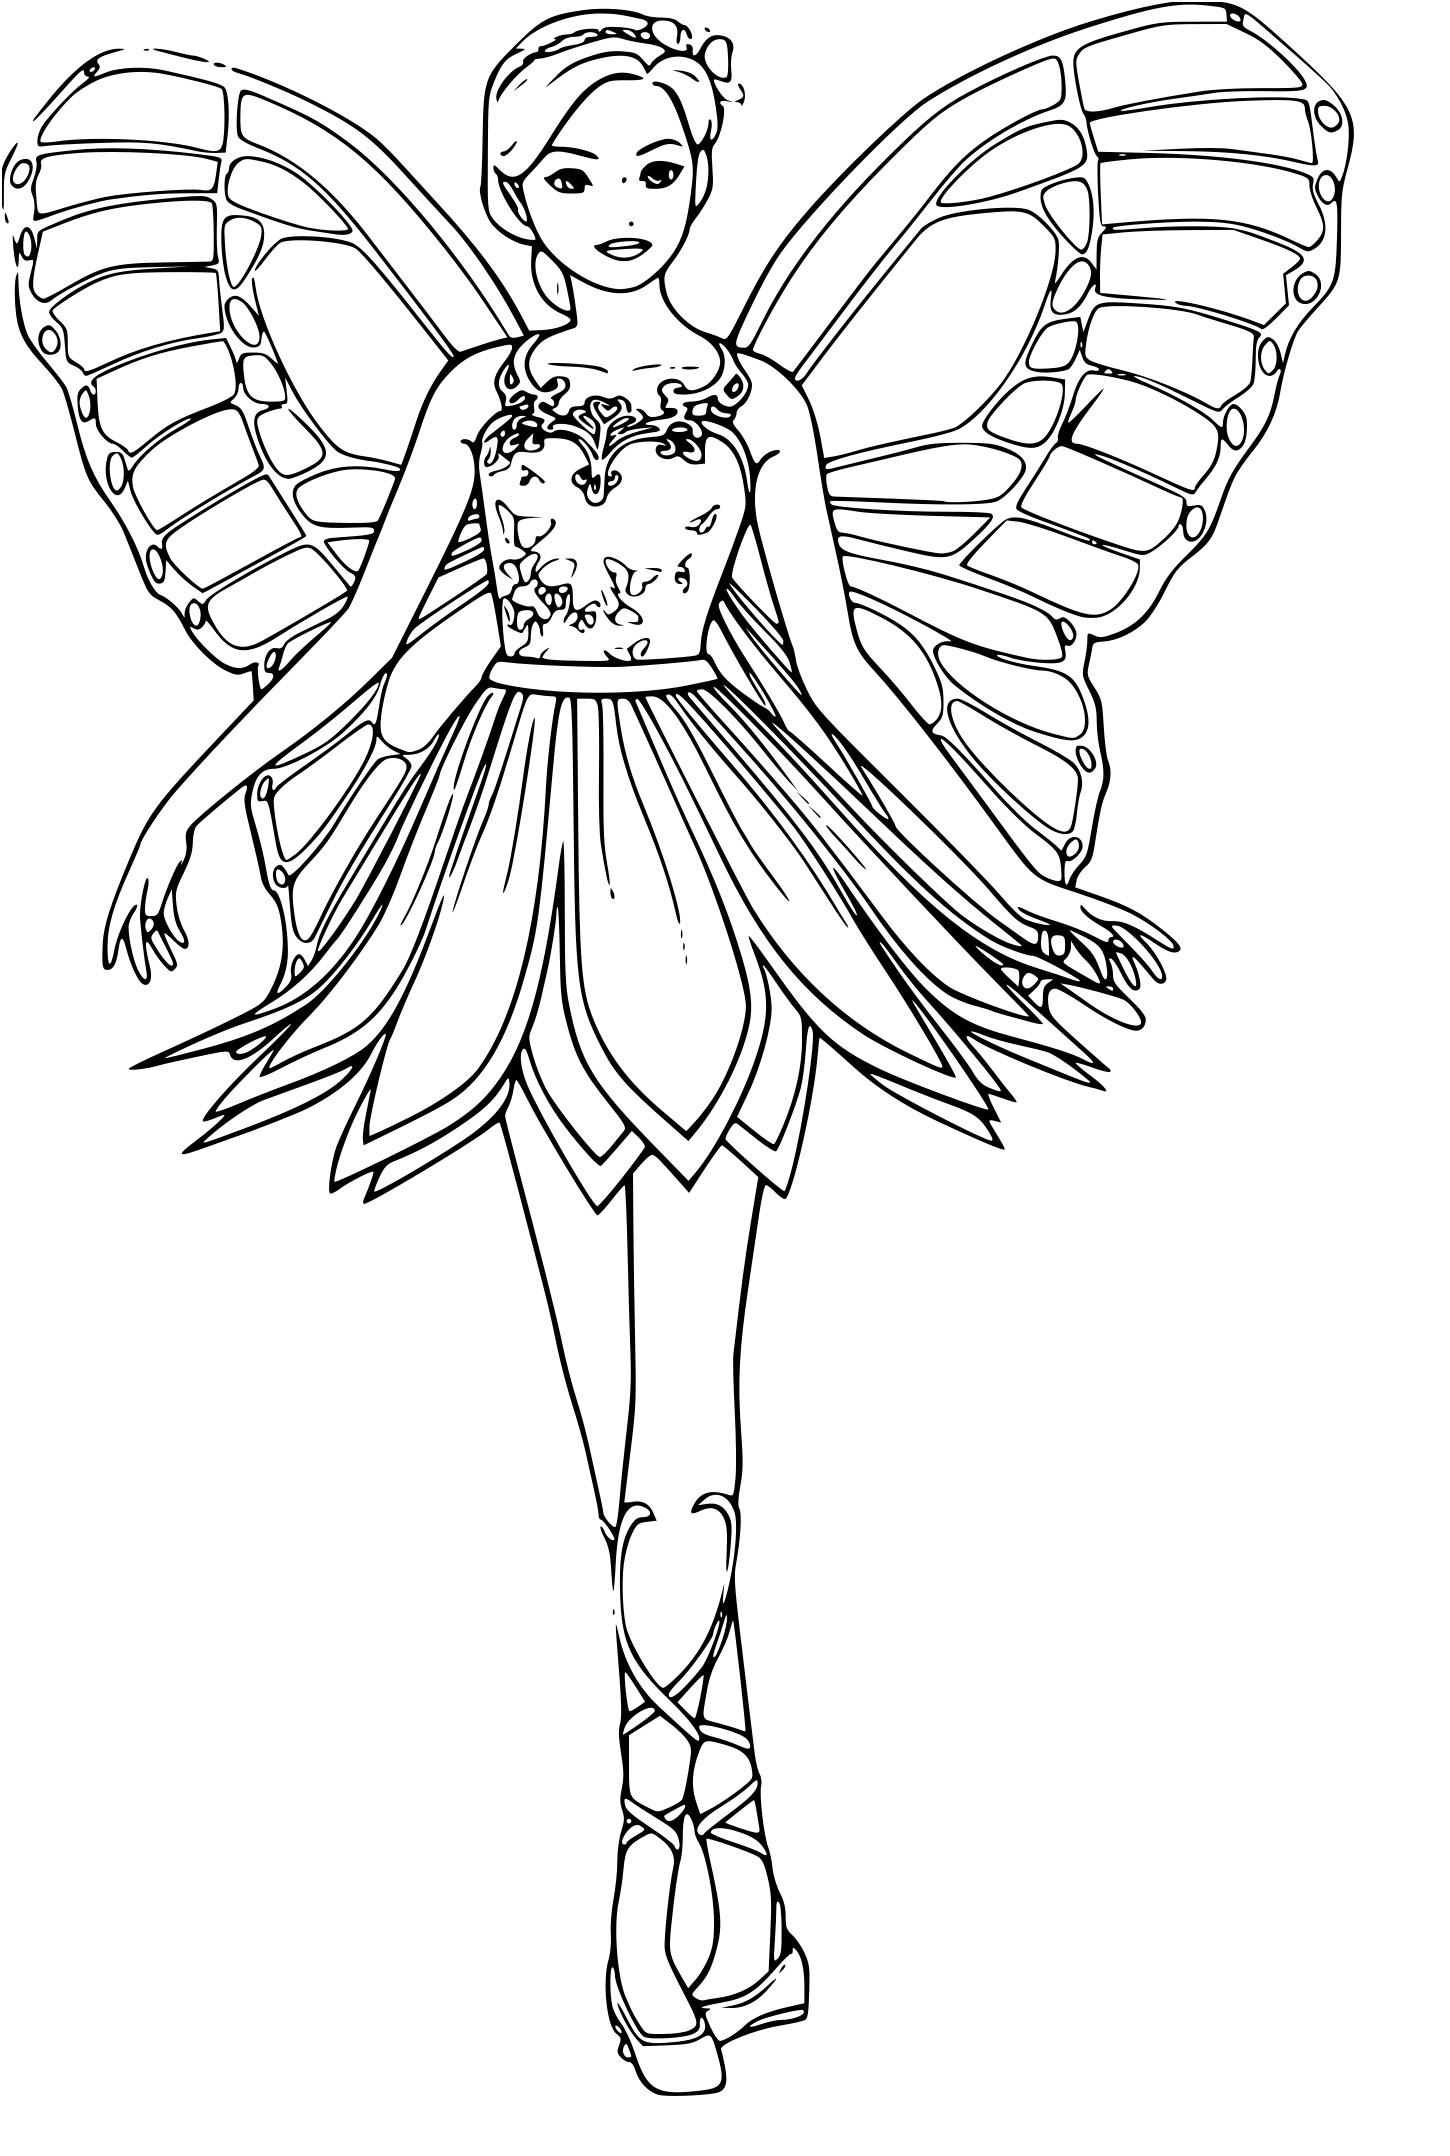 dessin à imprimer: Dessin A Imprimer Barbie A La Plage